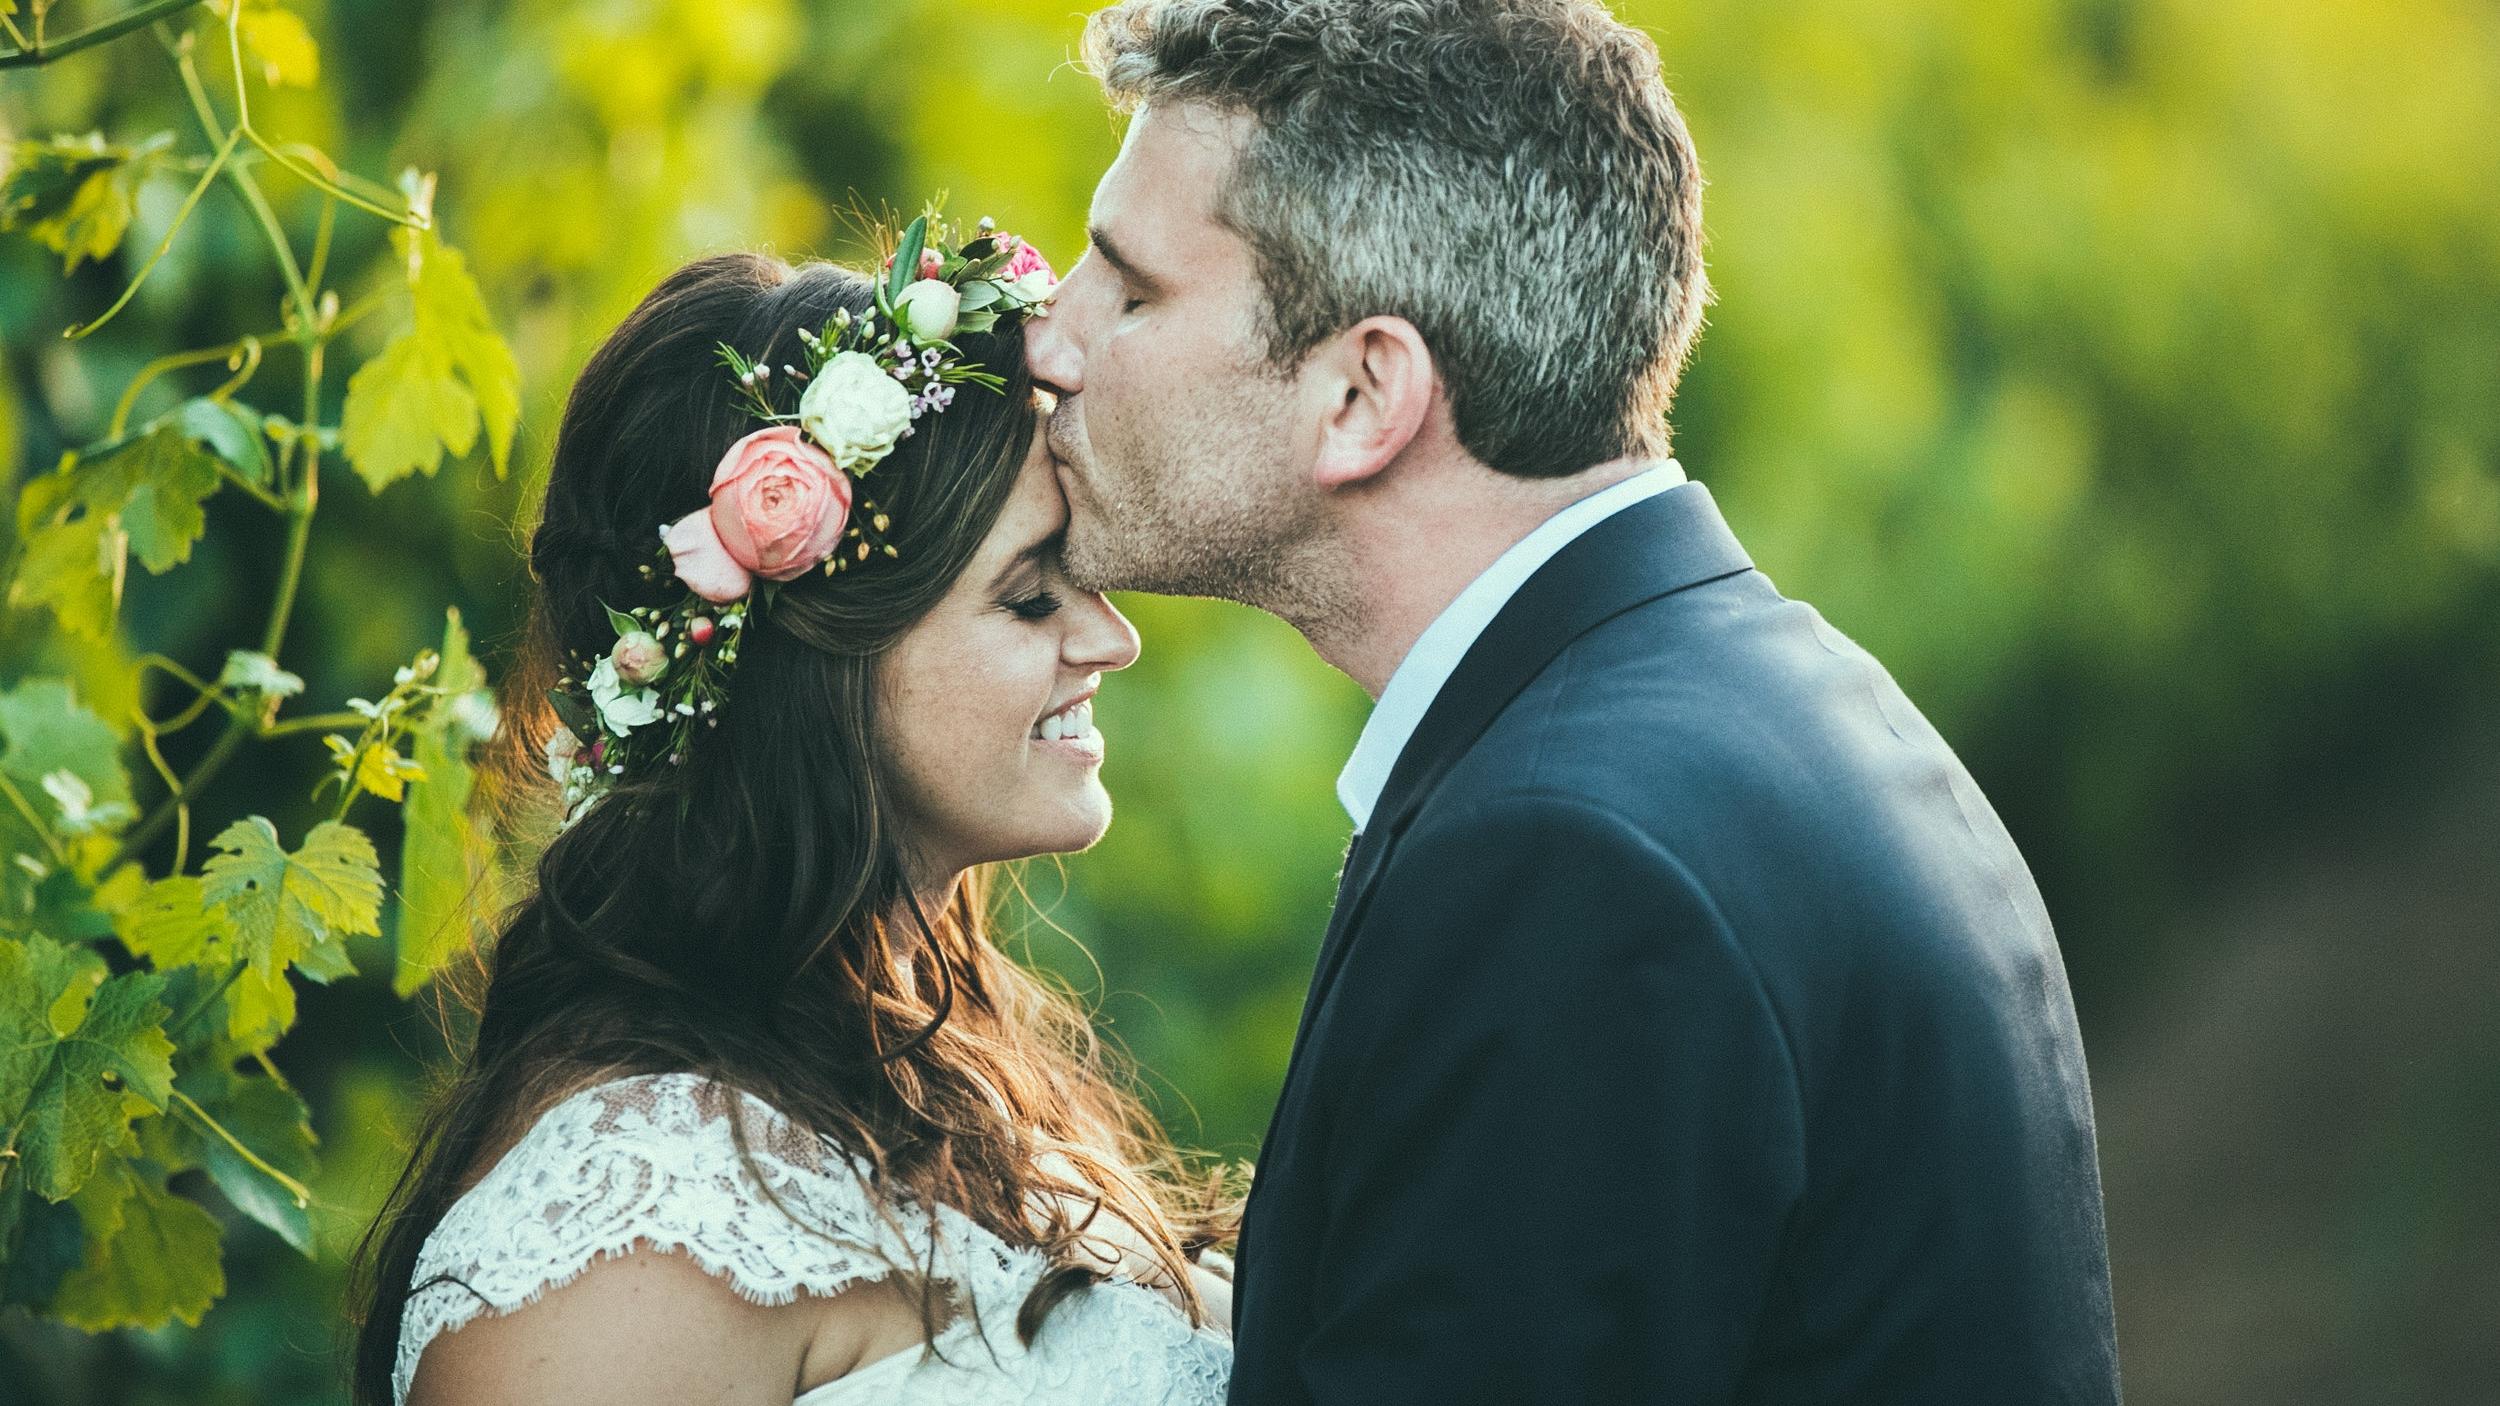 3260_20180602200653_2018_06_02_MattAndAlexa_Trentadue_Geyserville_wedding_200 mmISO 25001-1000 sec at f - 2.8CanonCanon EOS-1D X Mark II_seestheday.jpg